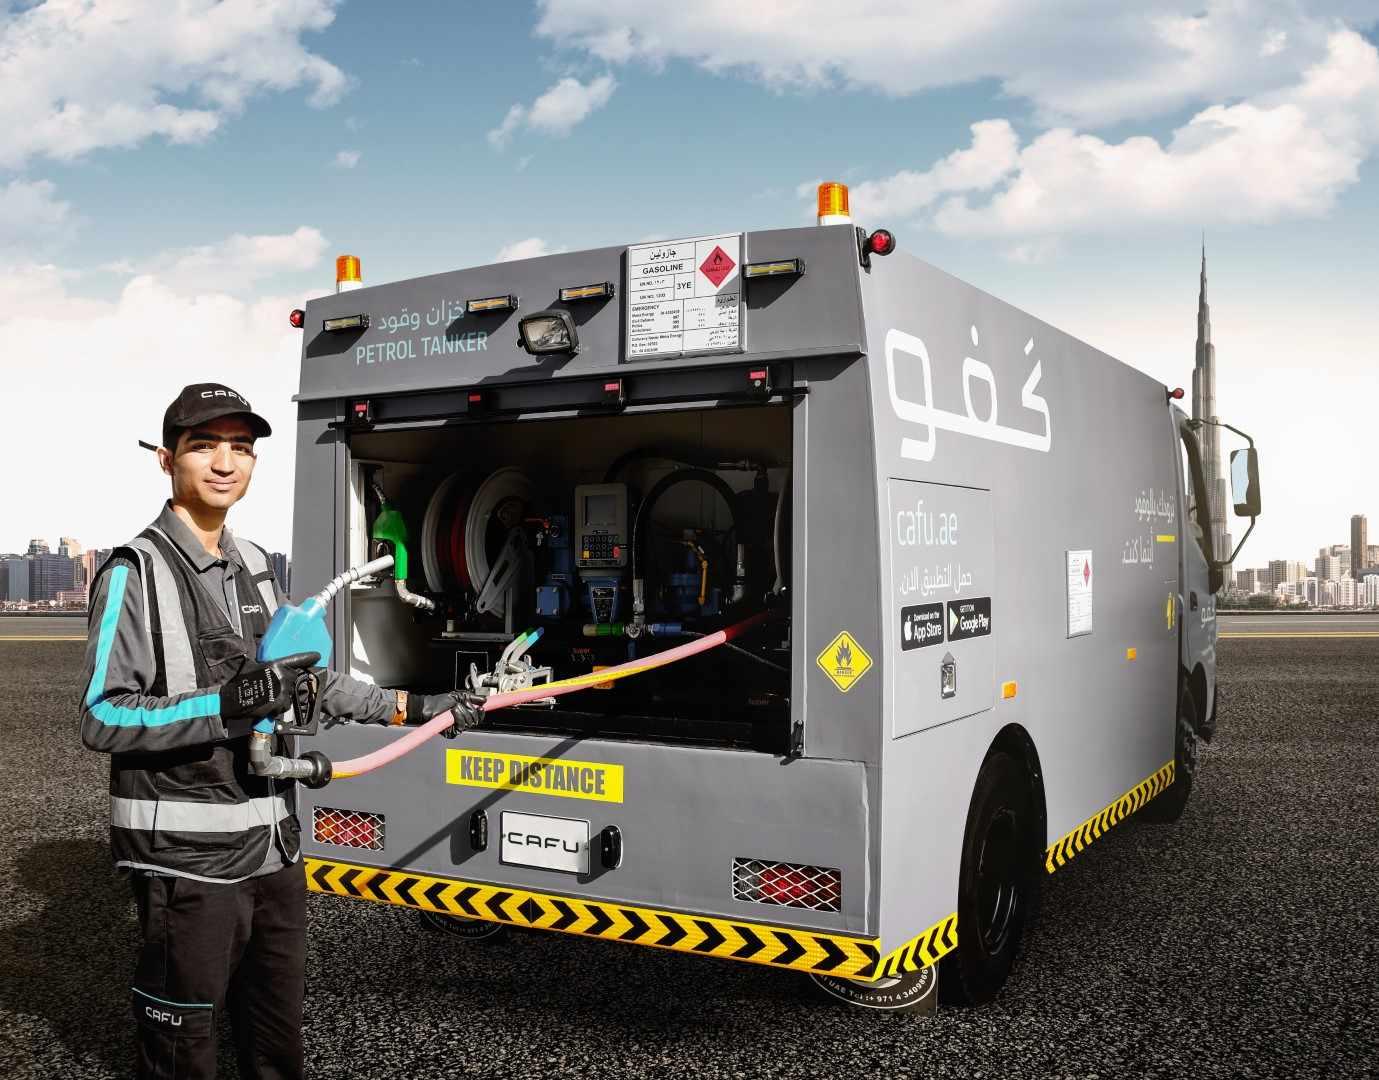 car global refuelling revolution cafu